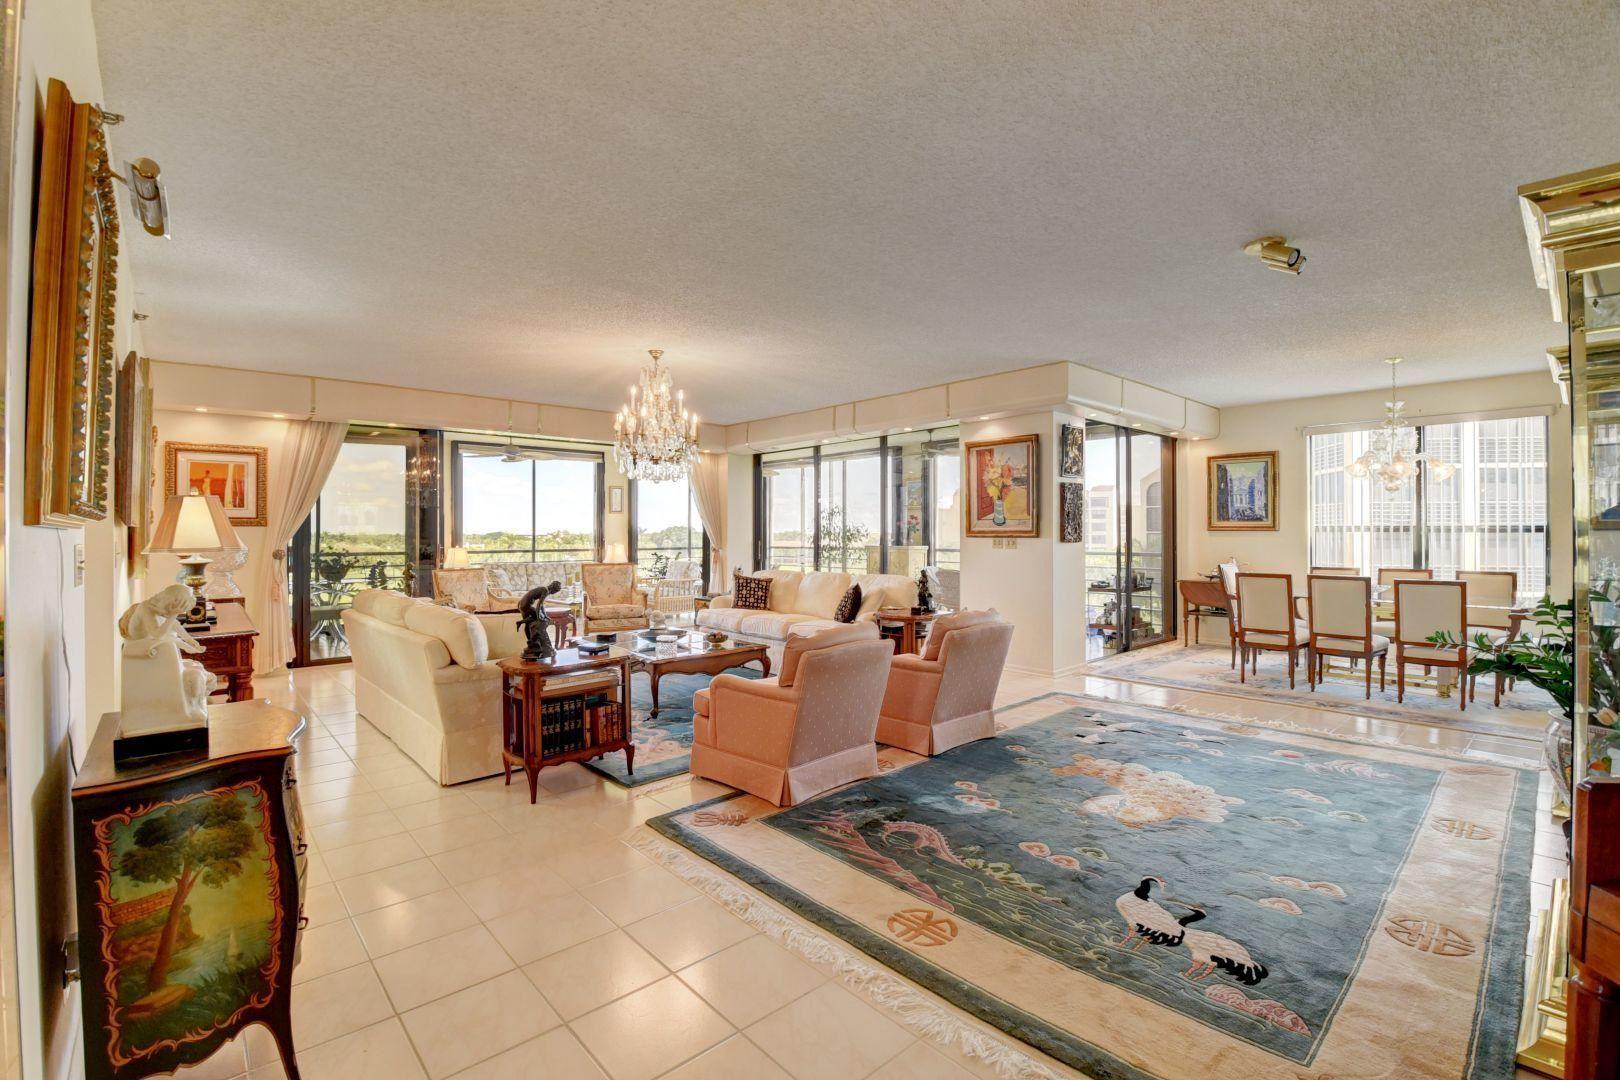 7235 Promenade Drive #K501, Boca Raton, FL 33433 - #: RX-10566612